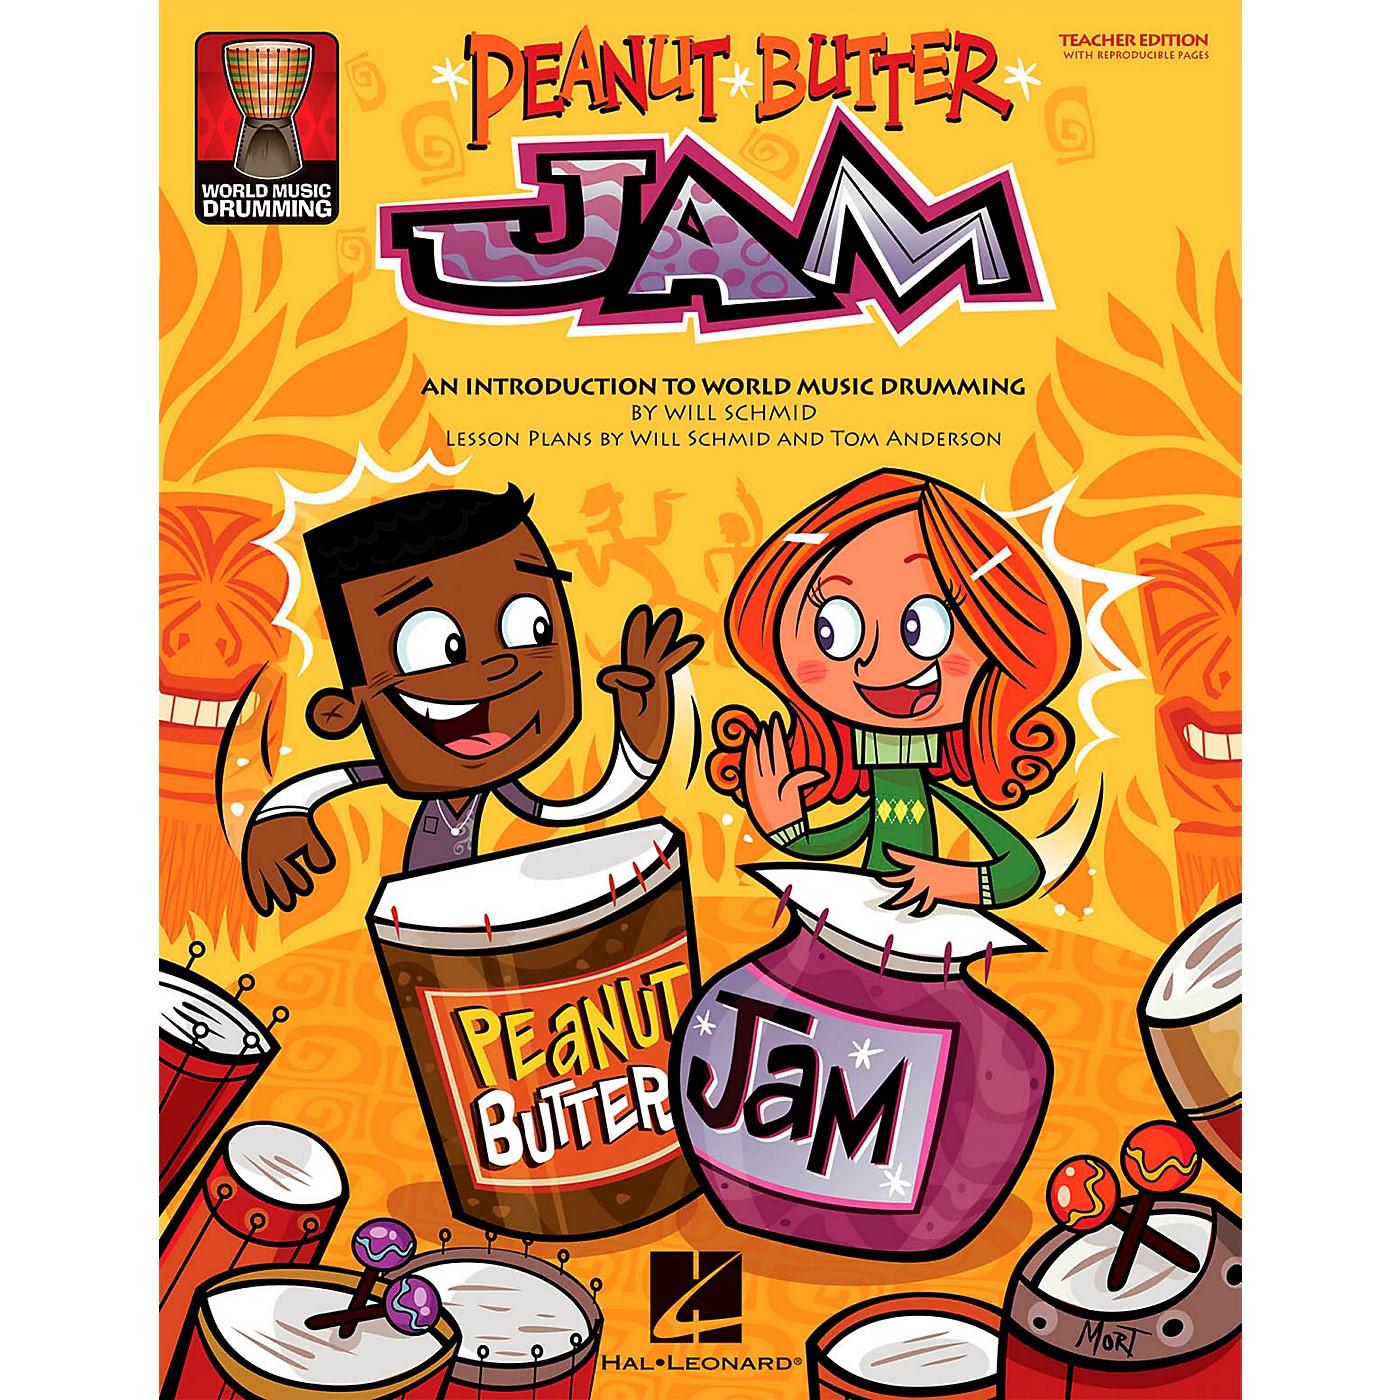 Hal Leonard Peanut Butter Jam - An Introduction to World Music Drumming Classroom Kit thumbnail